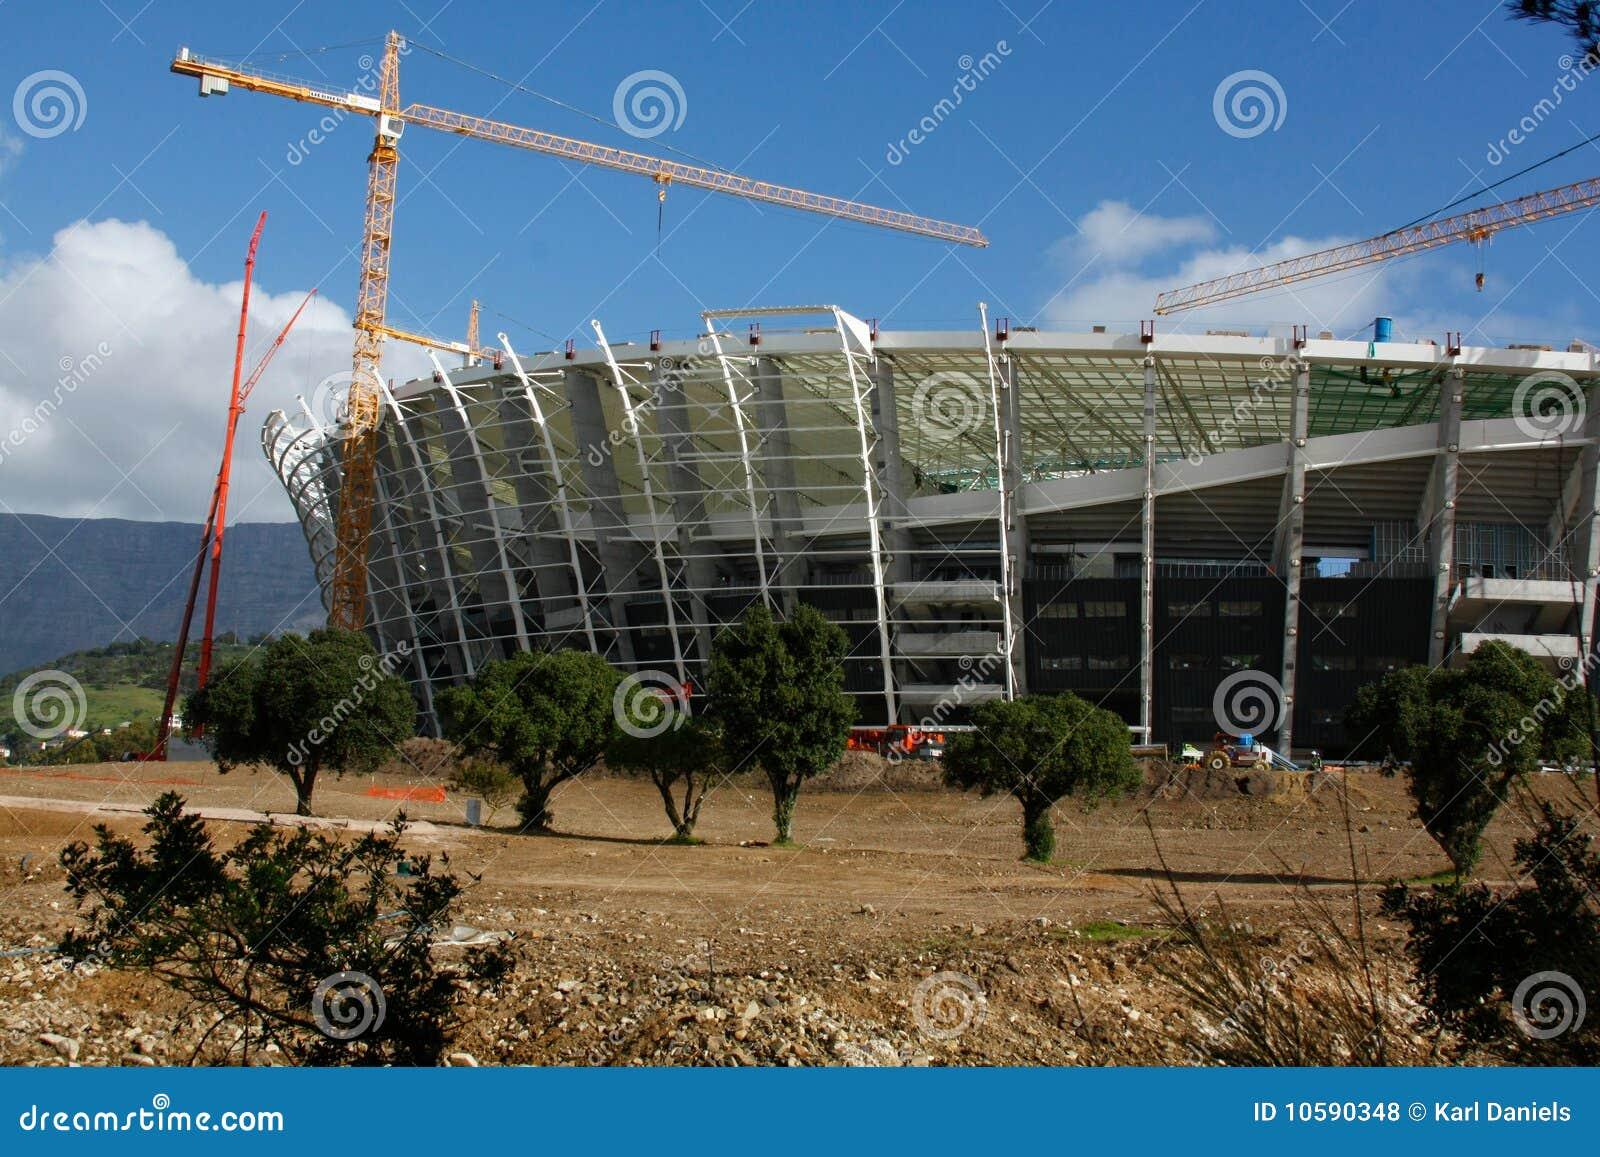 Green Point Stadium Construction